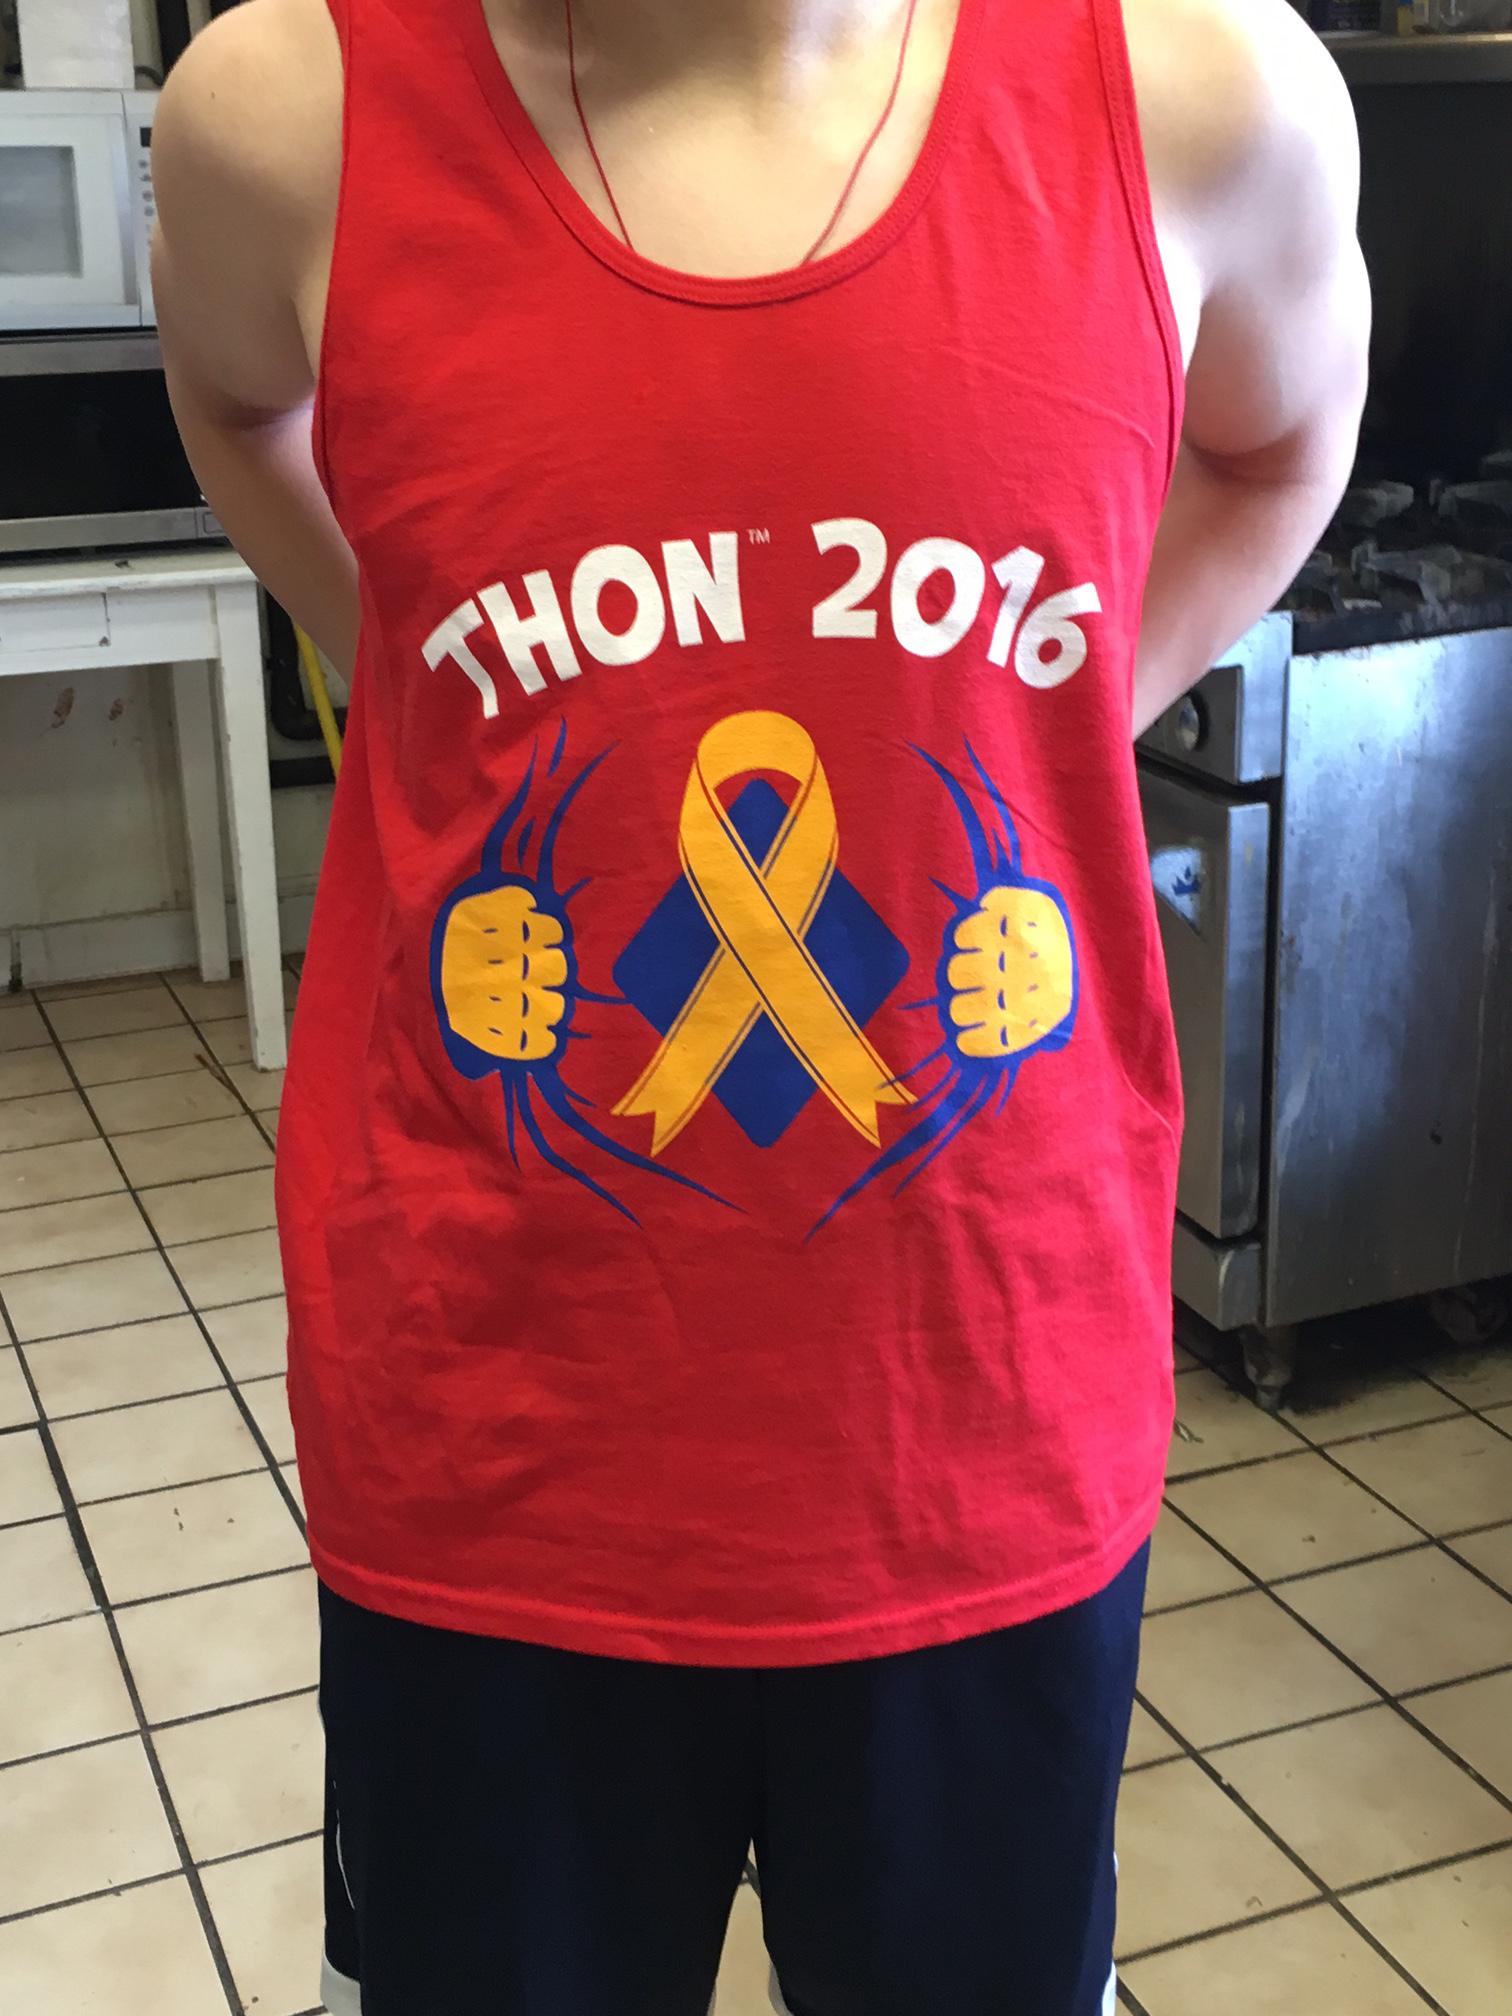 2016 THON T-Shirt (Front)